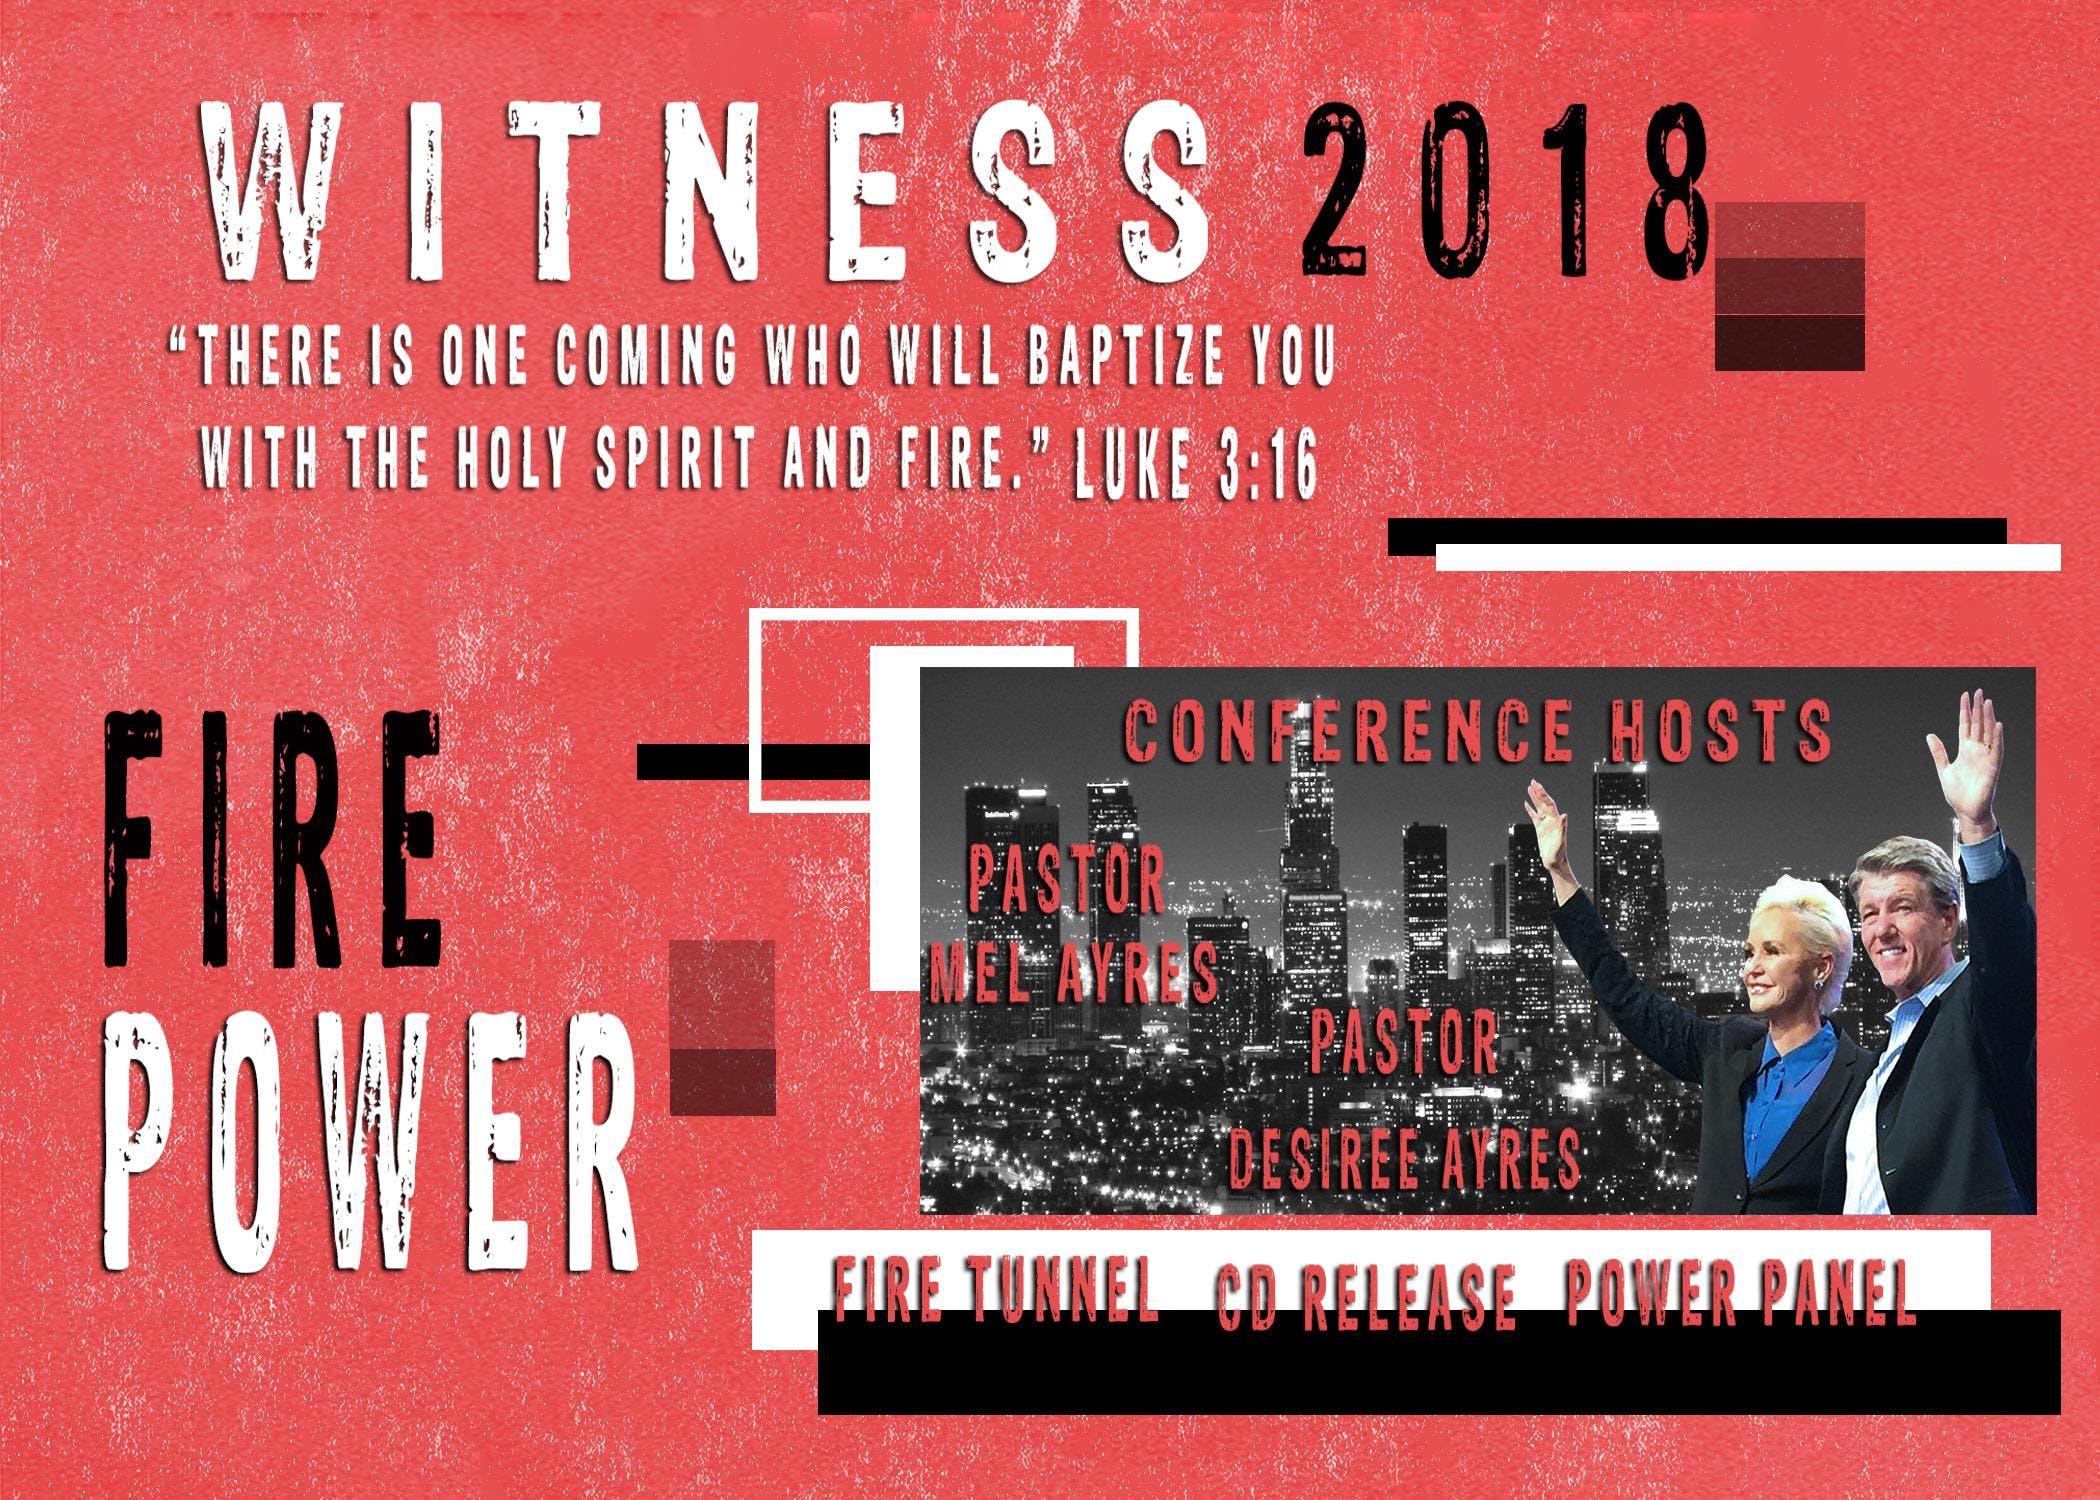 Witness 2018